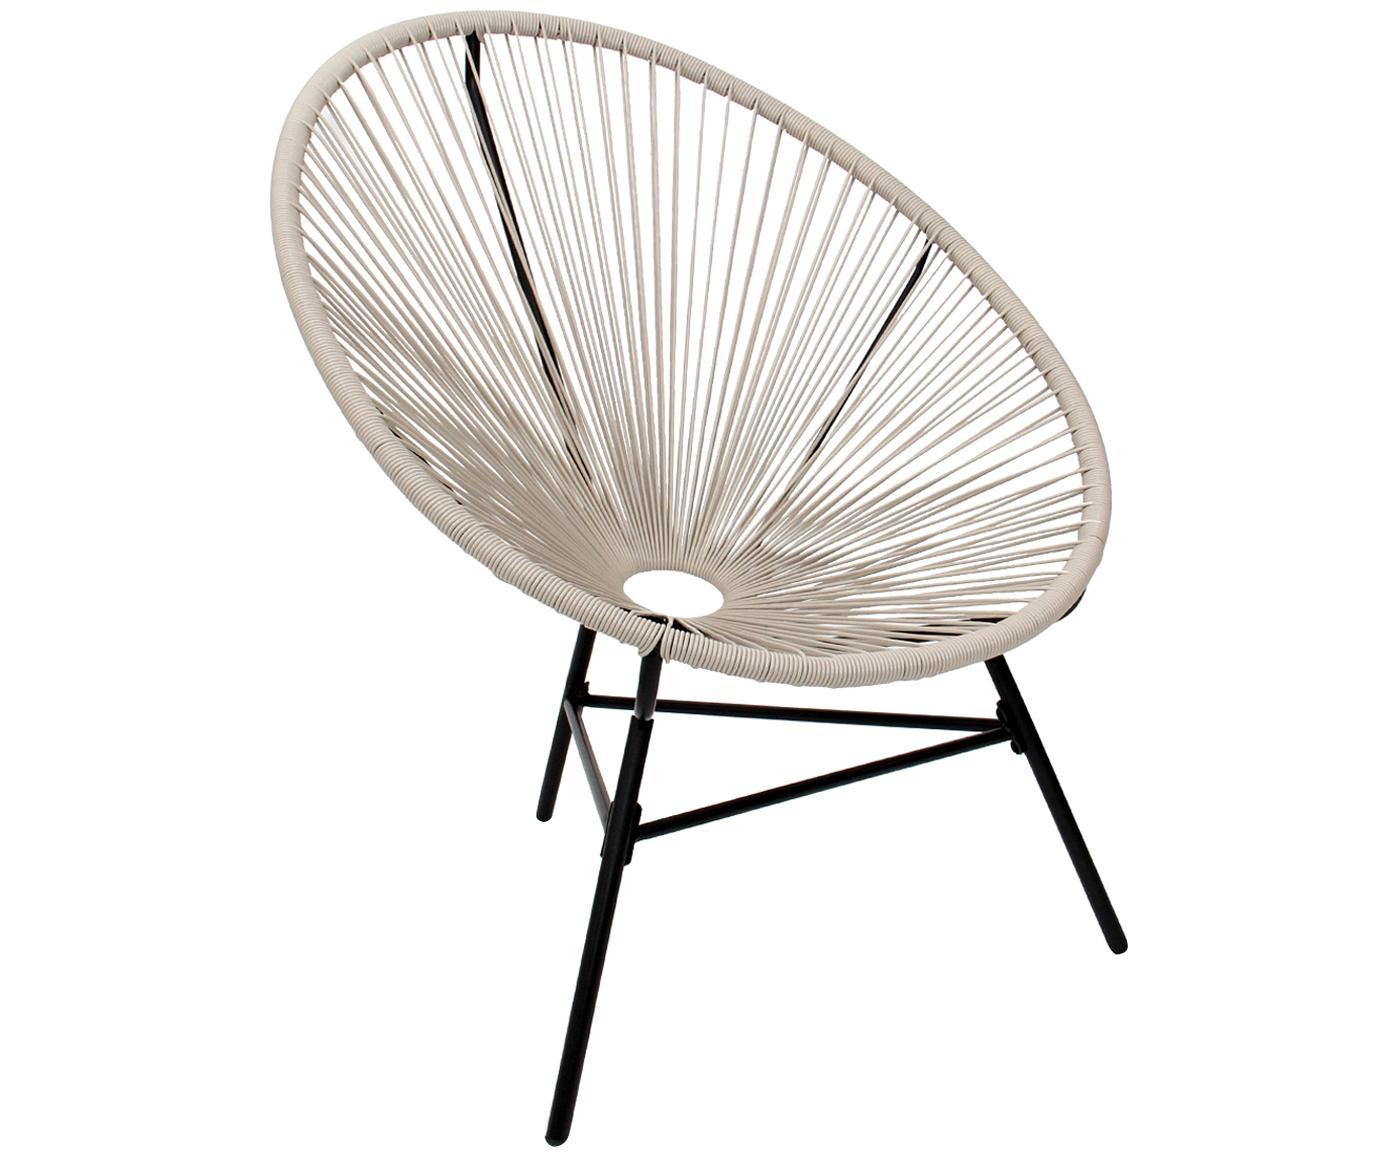 Retro fauteuil Bahia, Frame: Metaal, Zitvlak: Polyethyleen-vlechtwerk, Vlechtwerk: Taupe. Frame: Zwart, 81 x 88 cm